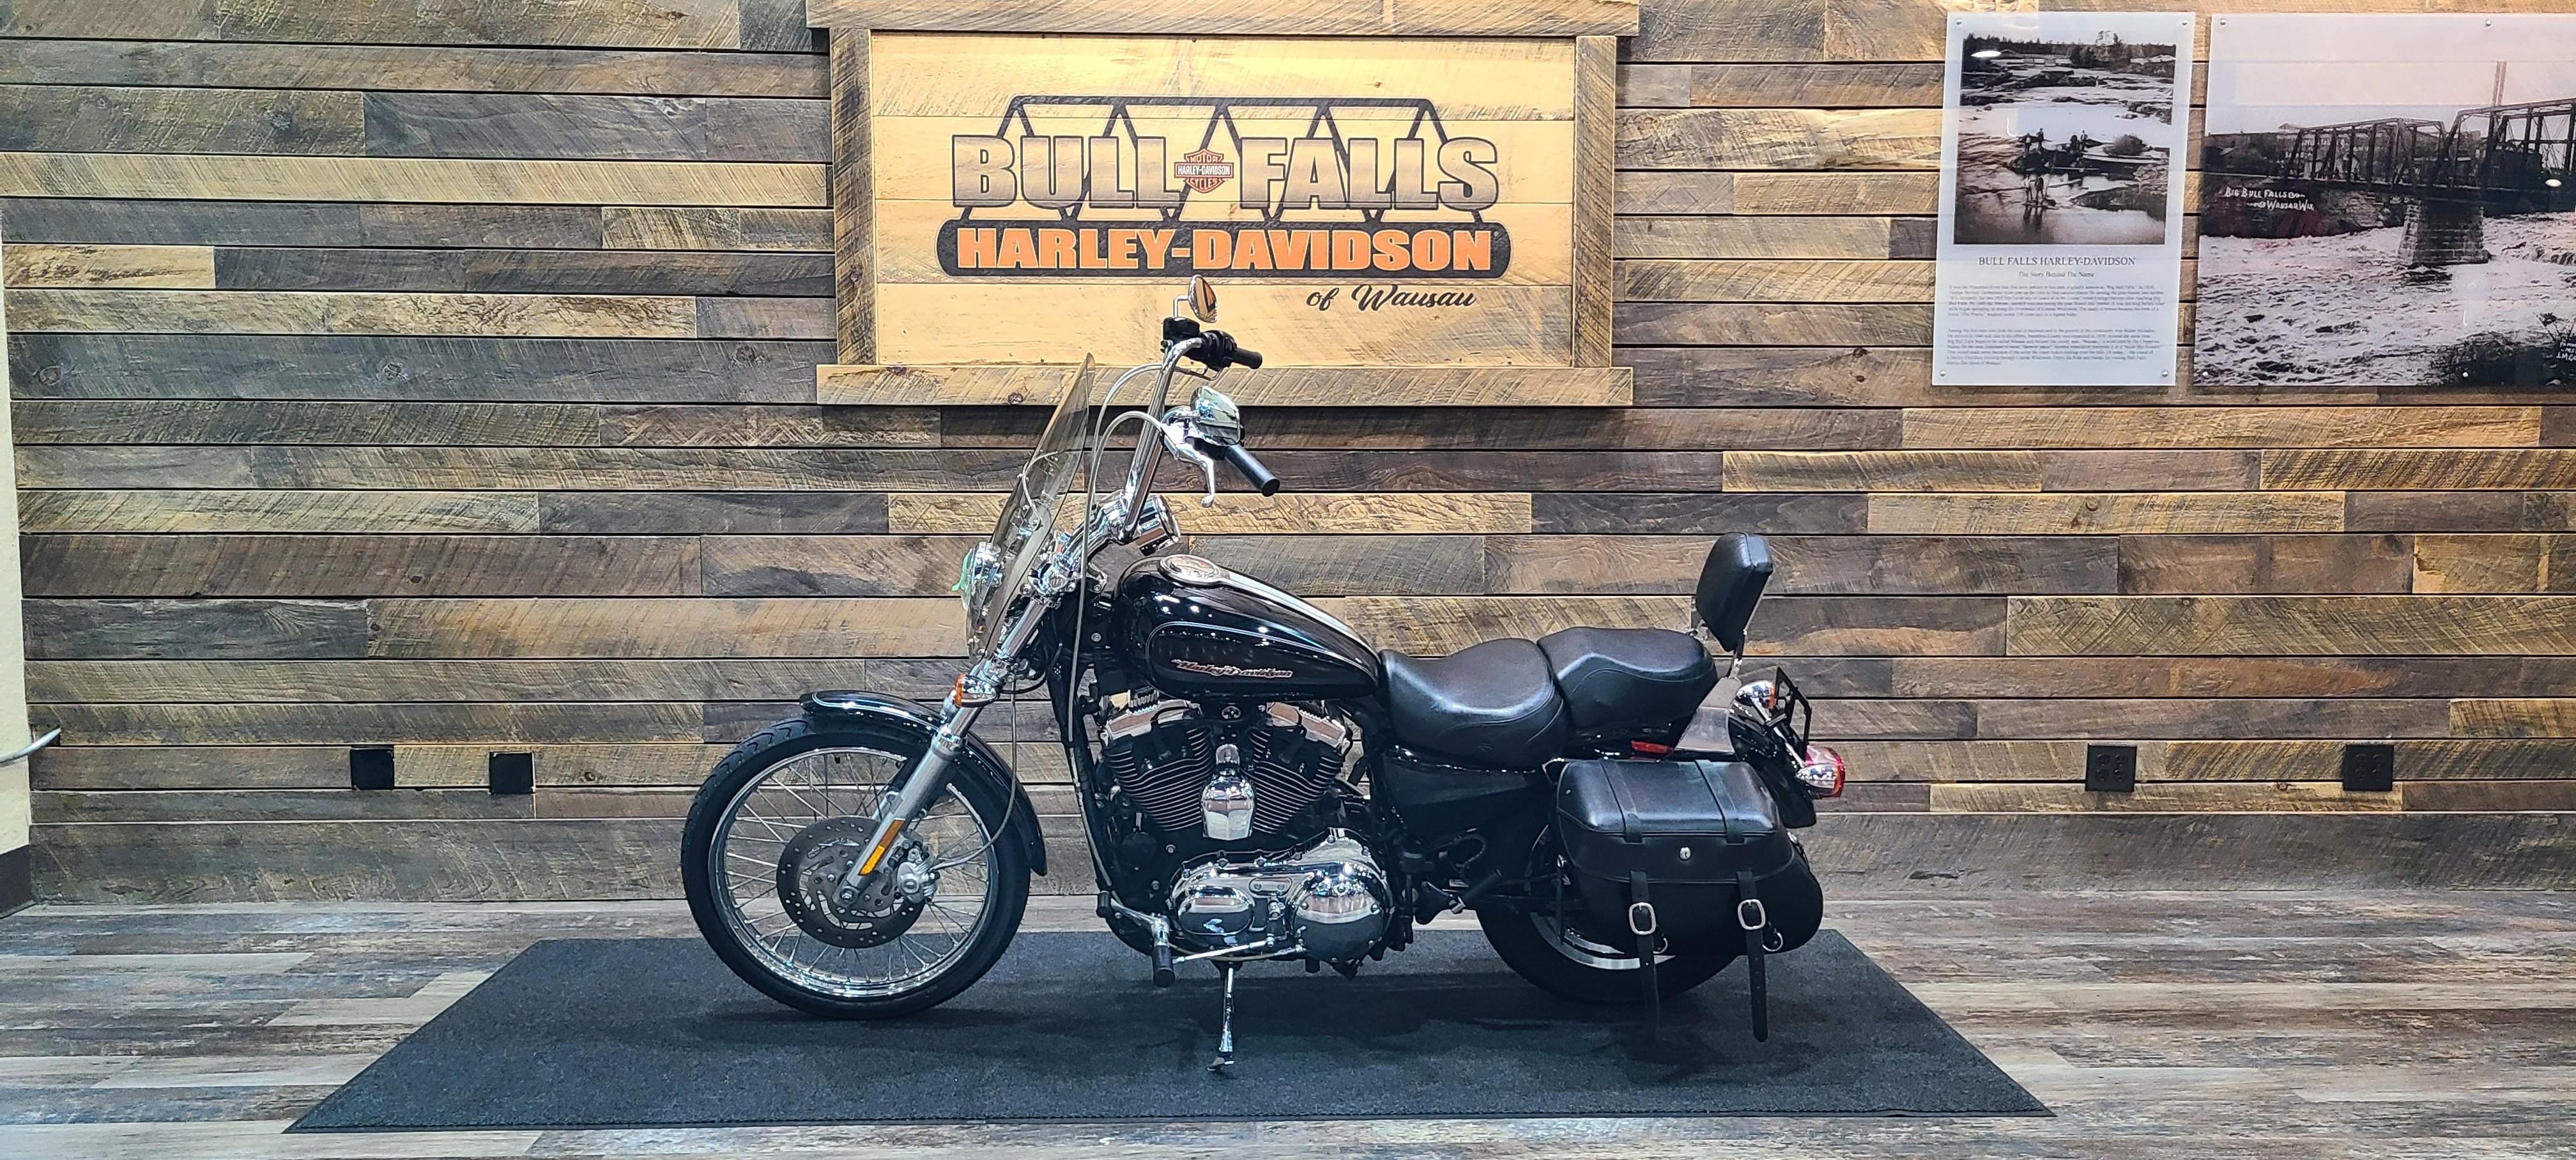 2004 Harley-Davidson Sportster 1200 Custom at Bull Falls Harley-Davidson